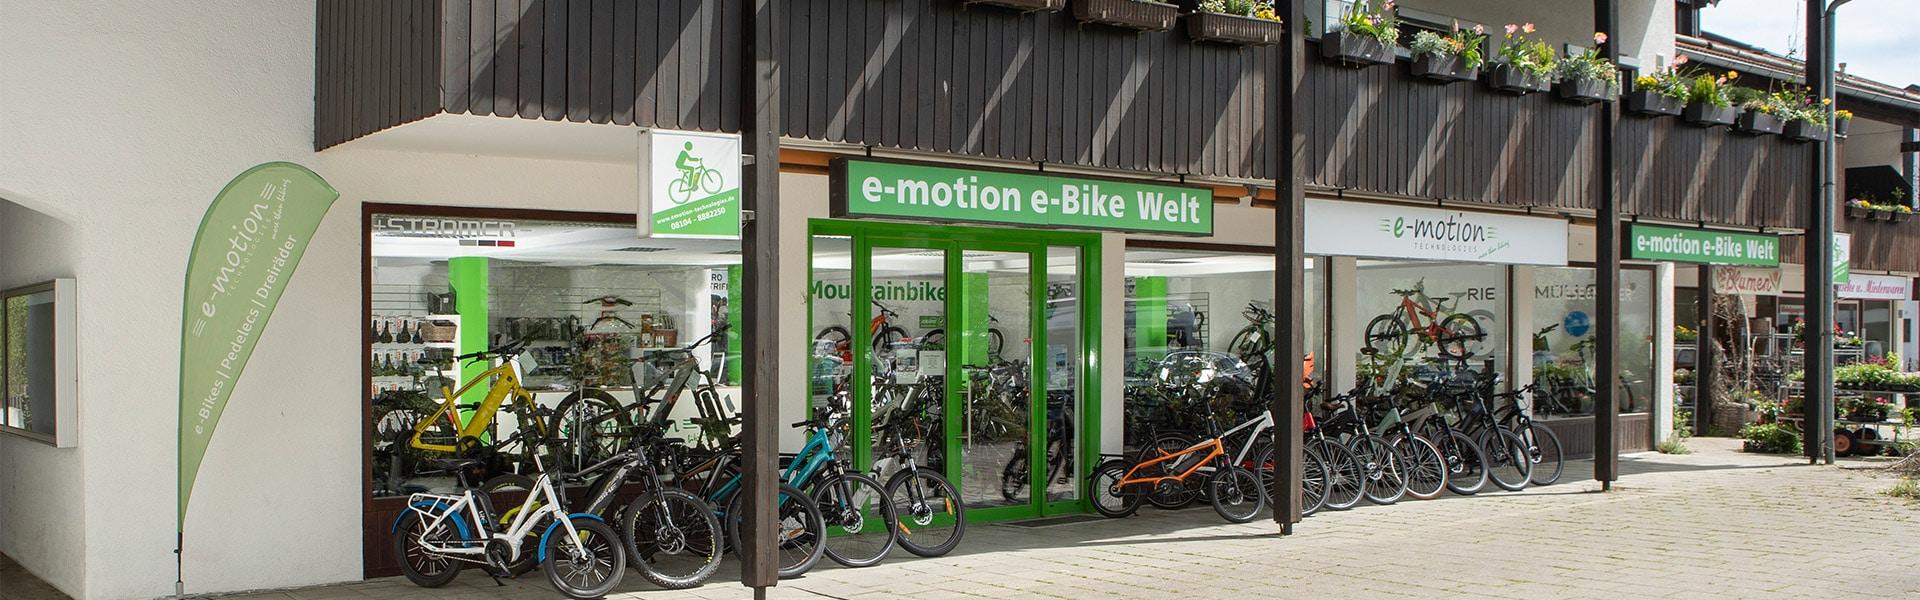 Der Shop der e-motion e-Bike Welt München Süd